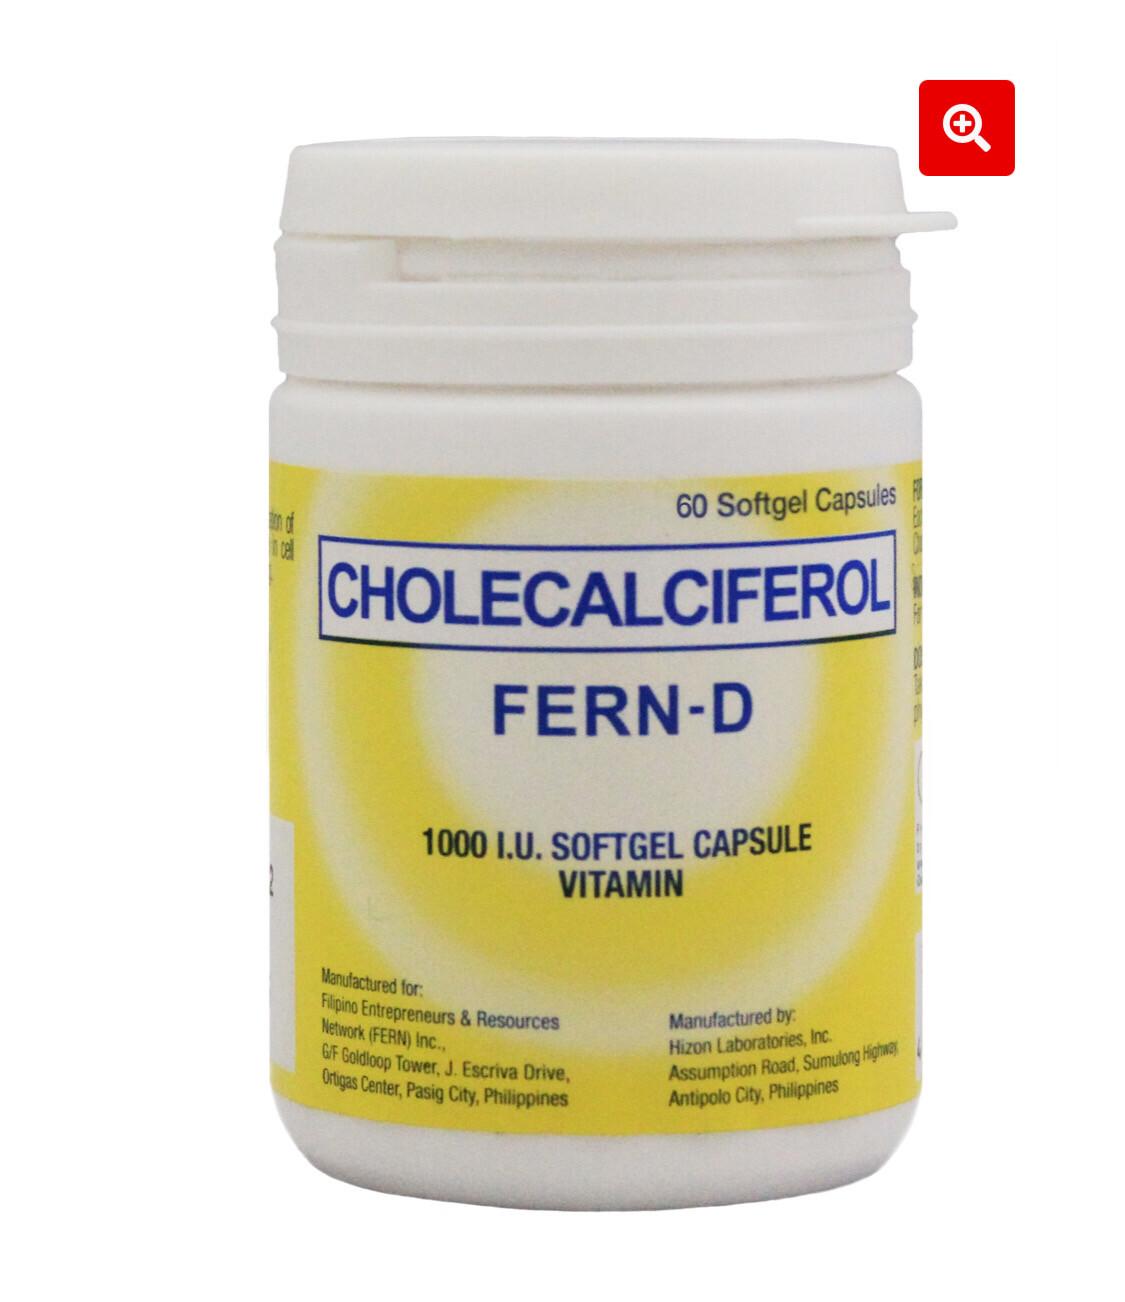 Cholecalciferol Vitamin D3 (Fern D) Bottle of 60 Softgel Capsule